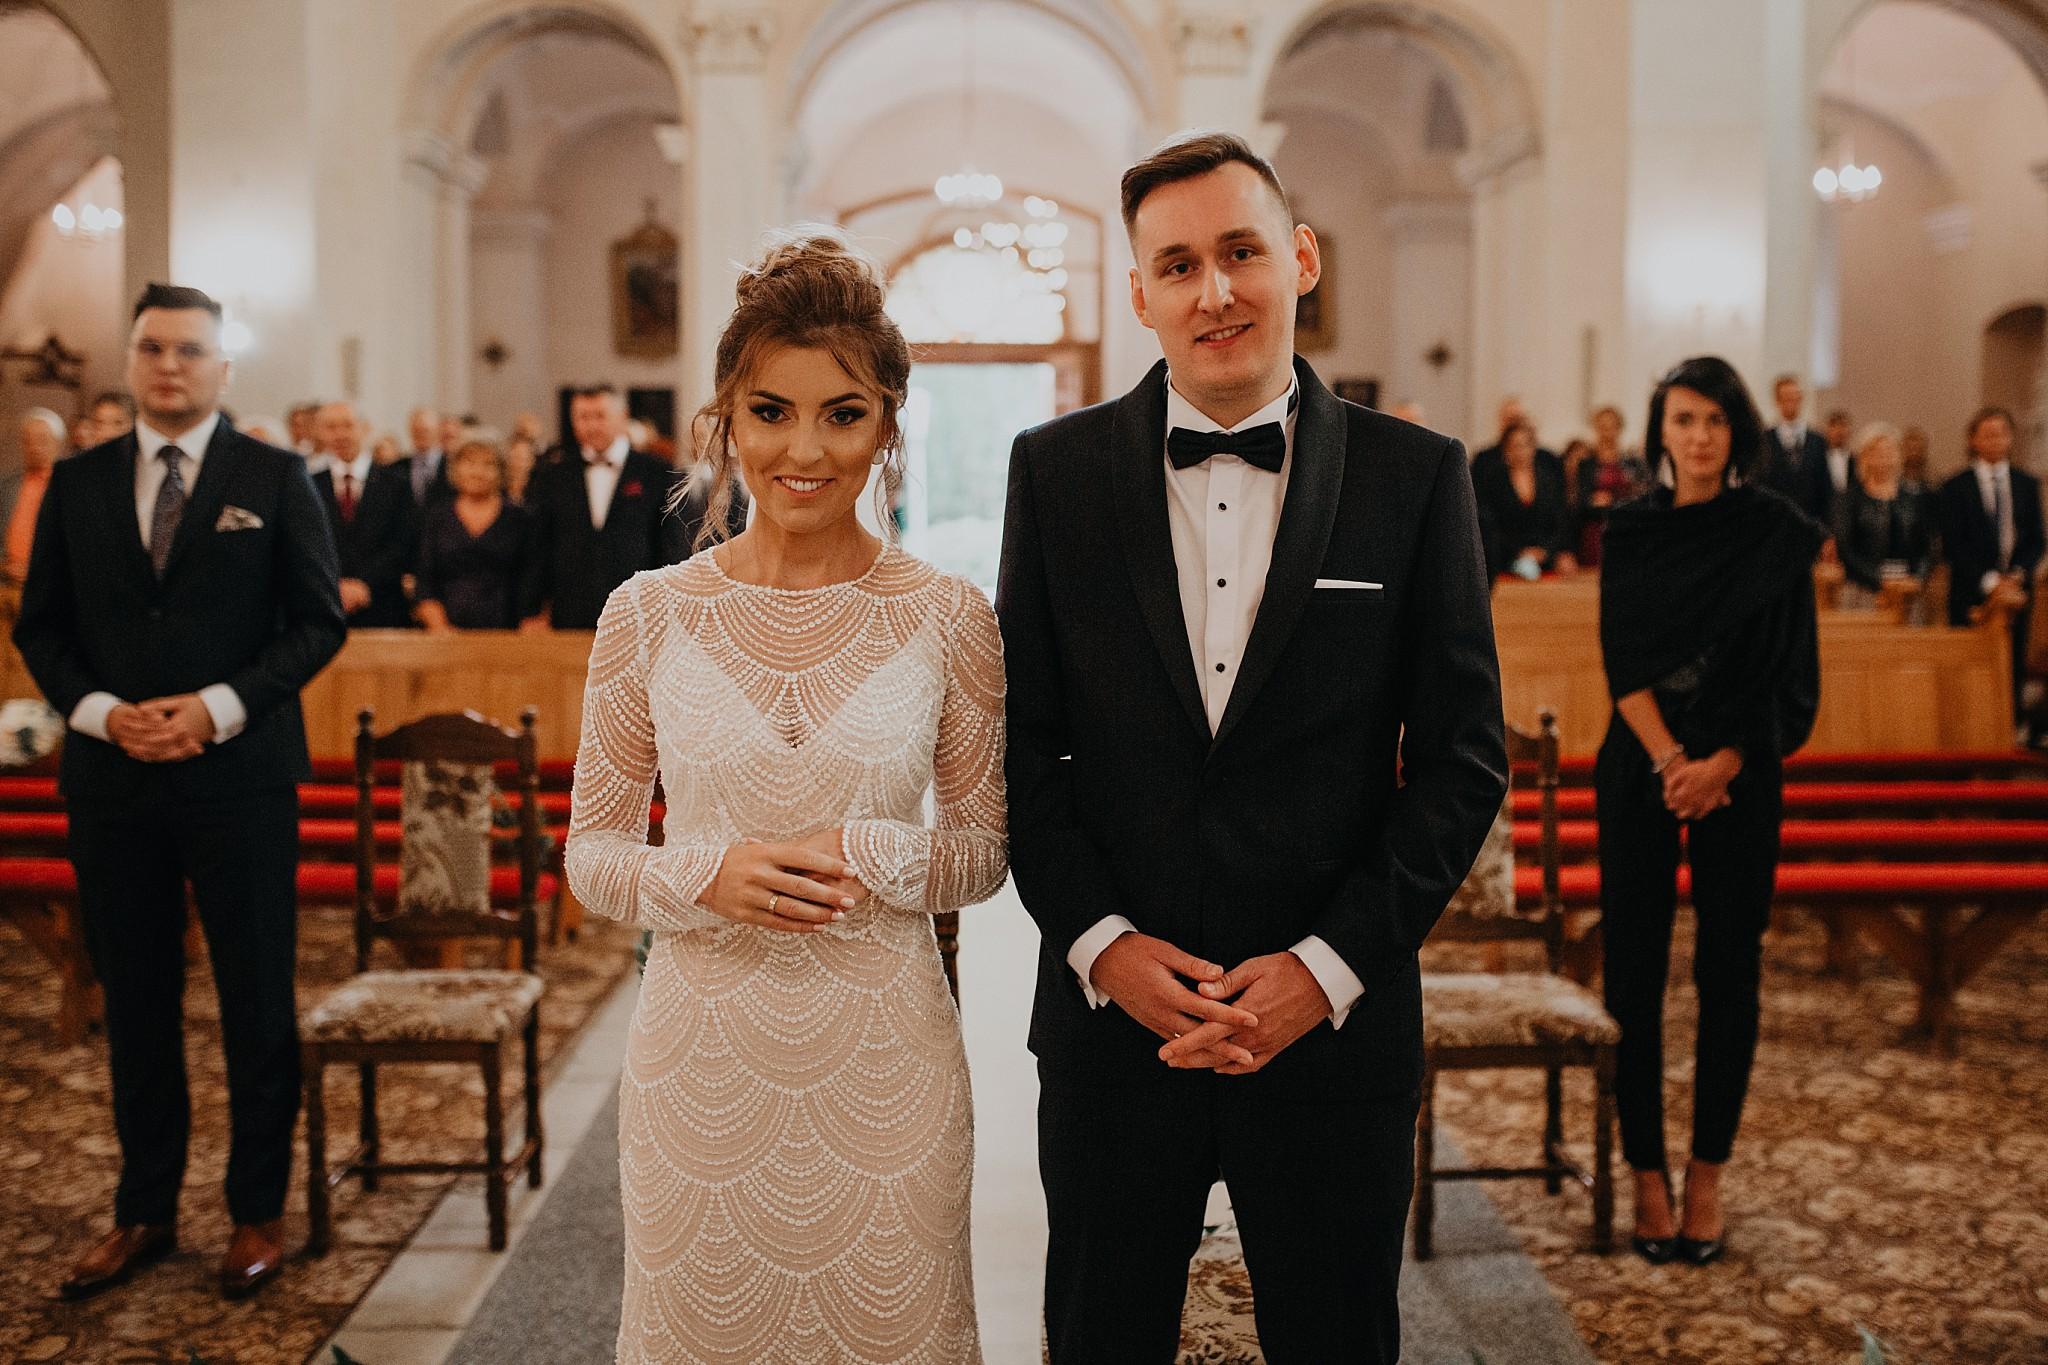 fotograf poznan wesele dobra truskawka piekne wesele pod poznaniem wesele w dobrej truskawce piekna para mloda slub marzen slub koronawirus slub listopad wesele koronawirus 184